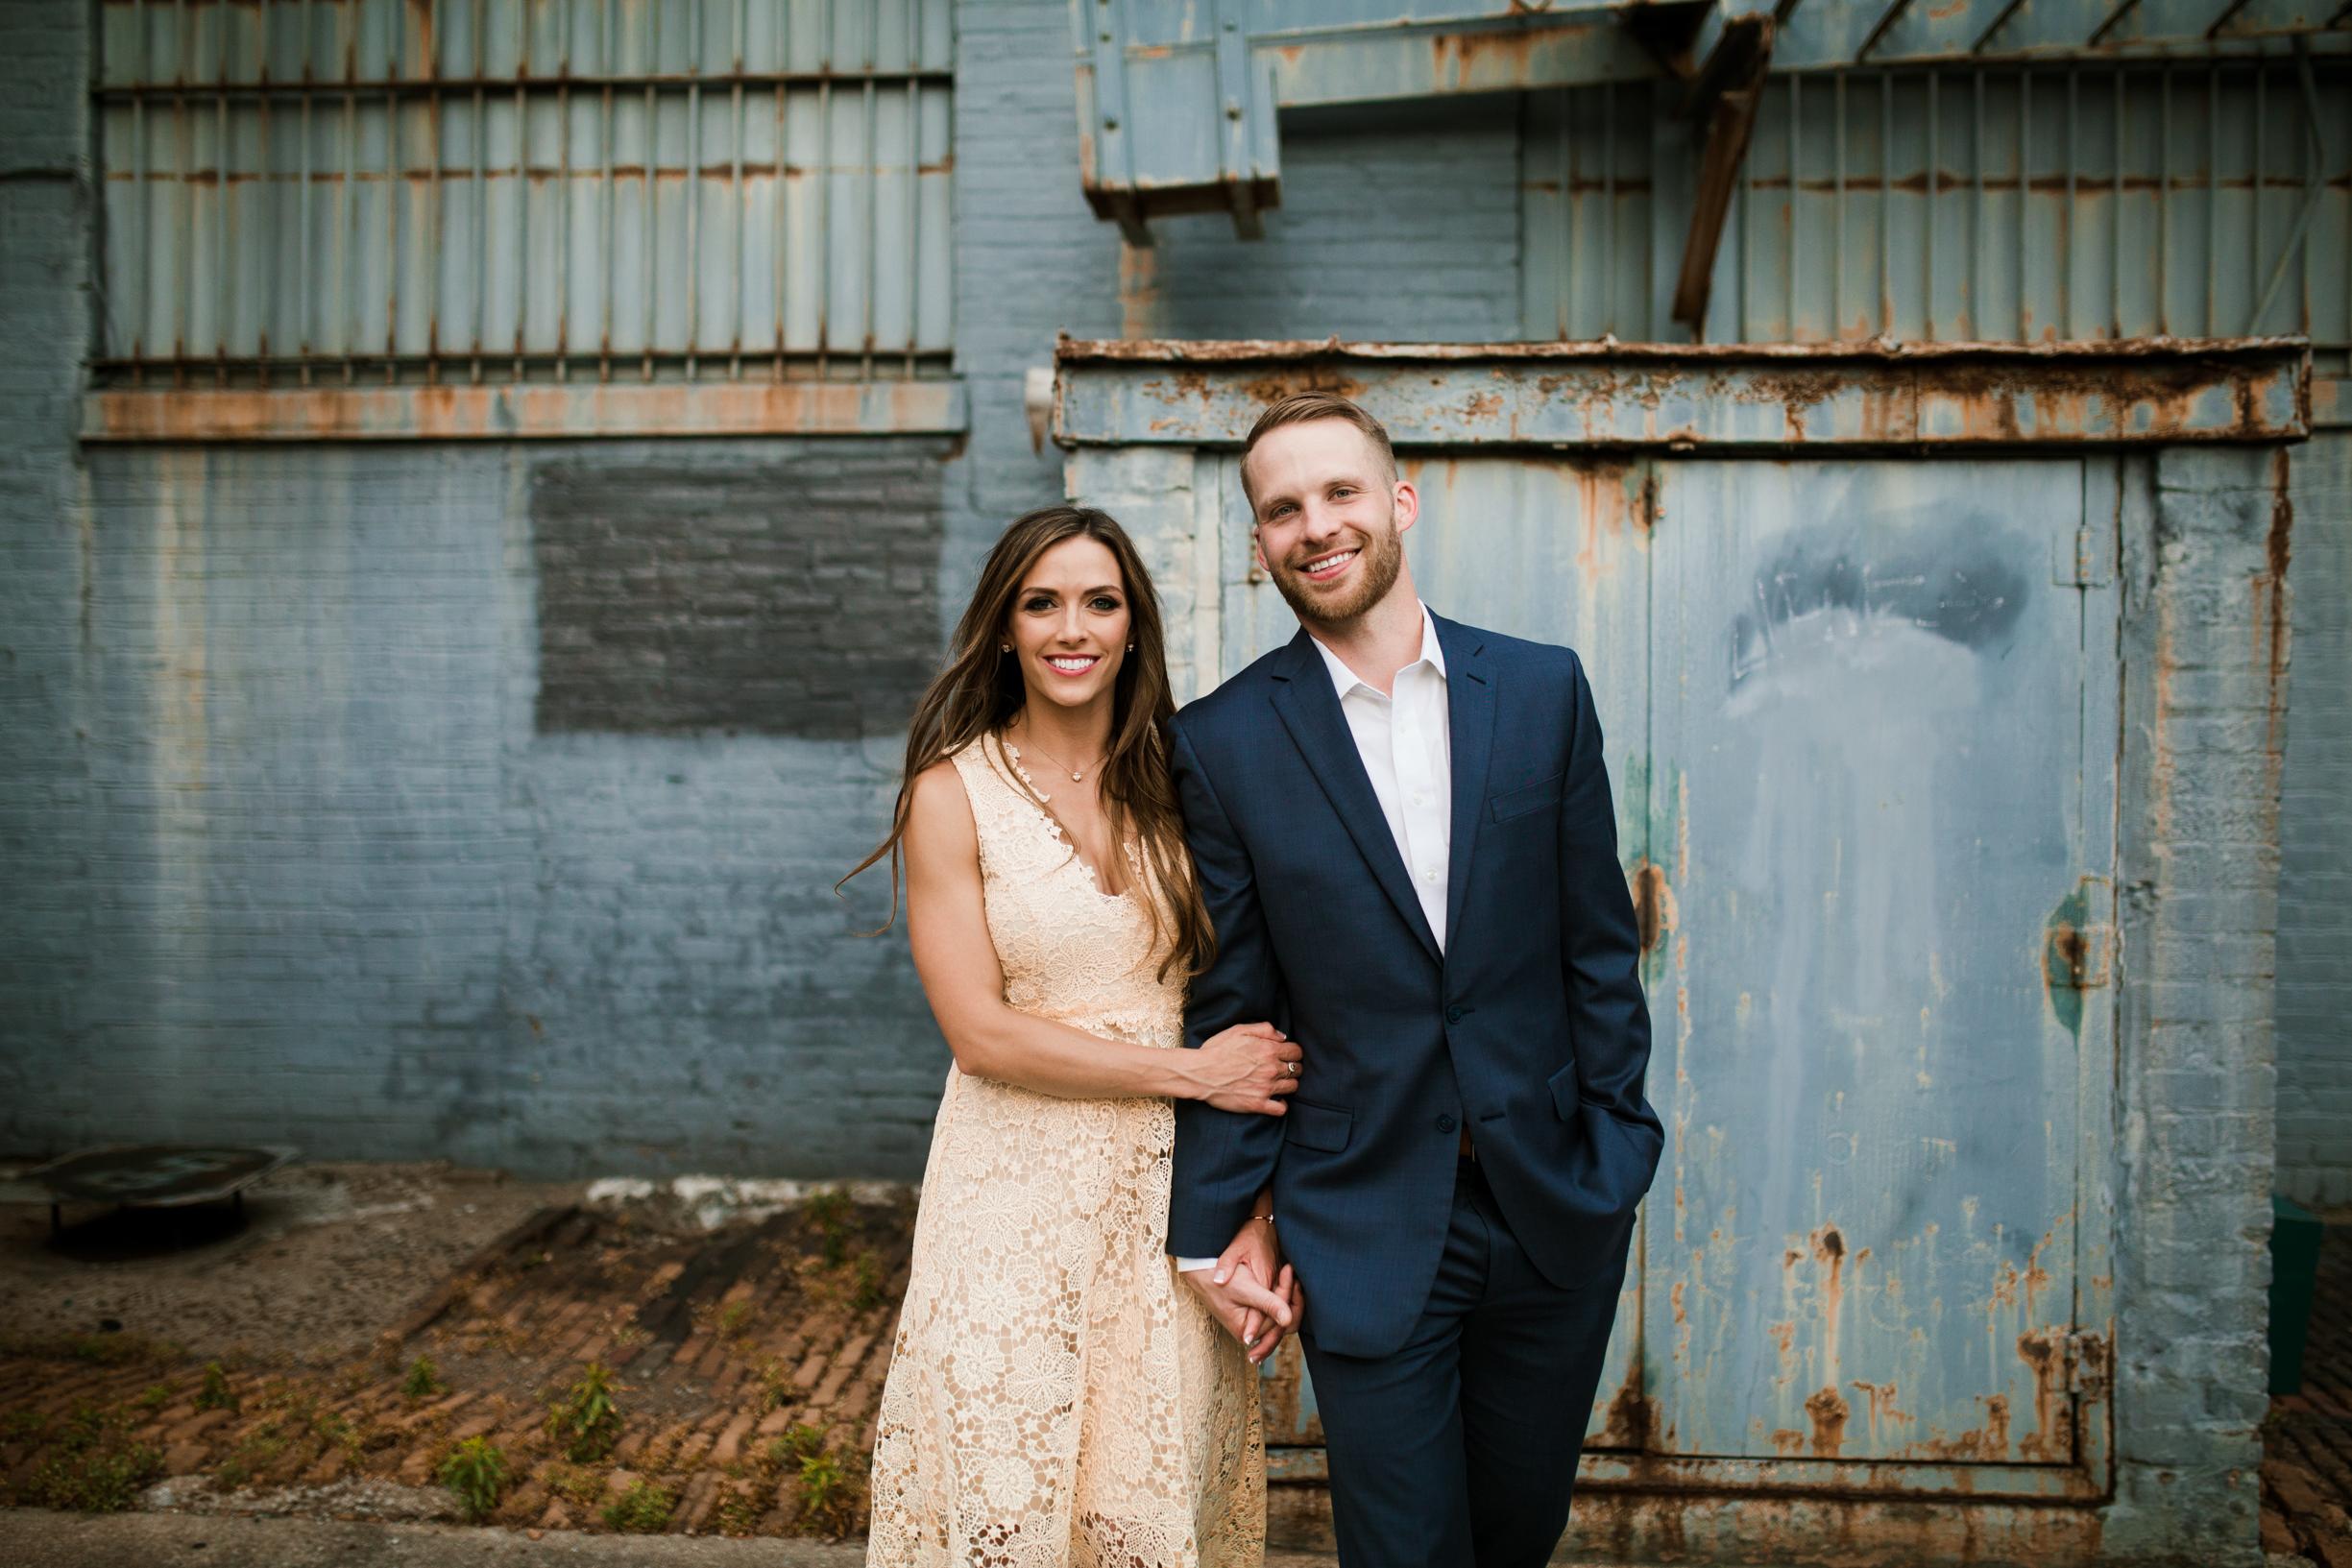 Victoria & Chad Engagement 2018 Crystal Ludwick Photo Louisville Kentucky Wedding Photographer WEBSITE (42 of 48).jpg